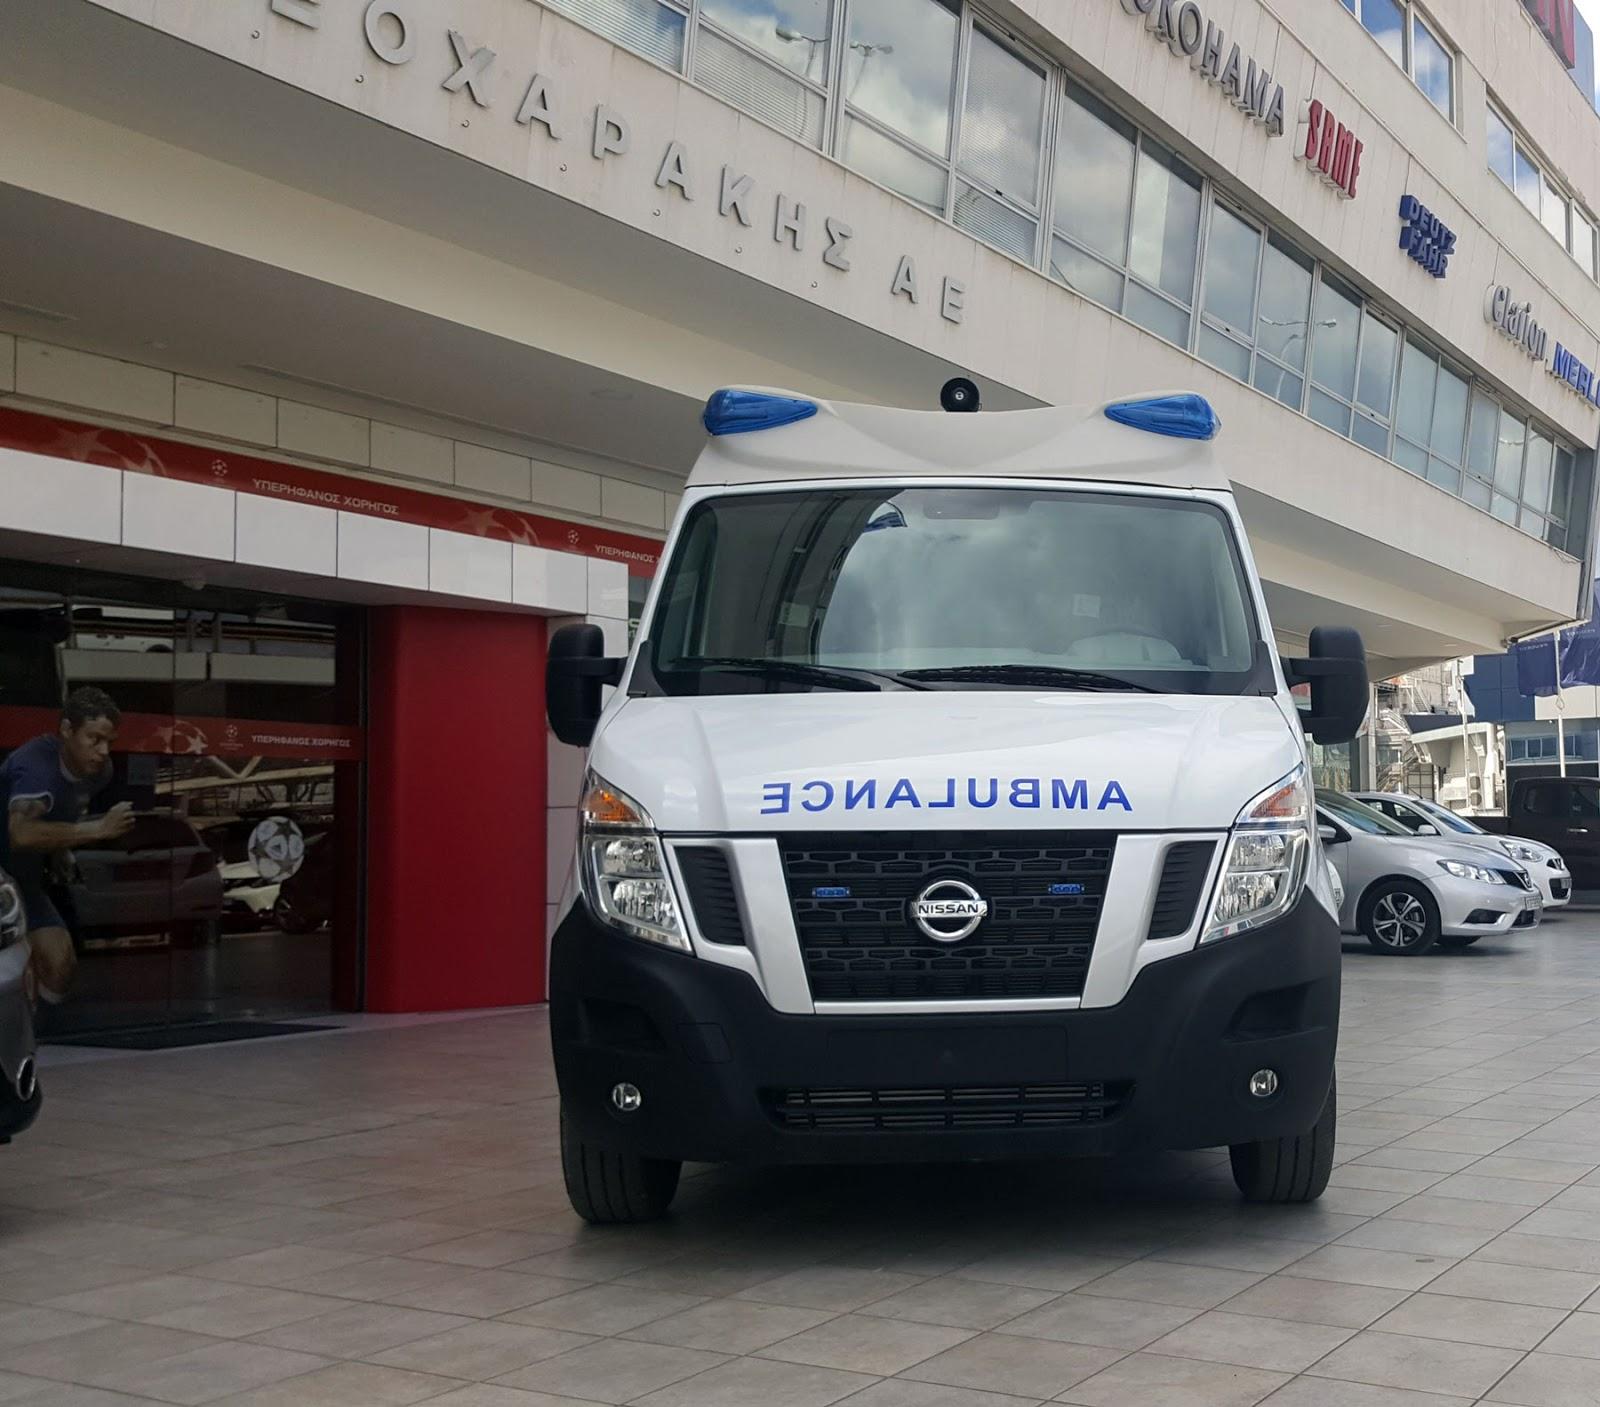 NV400 AMBULANCE1 Ασθενοφόρο Nissan NV400